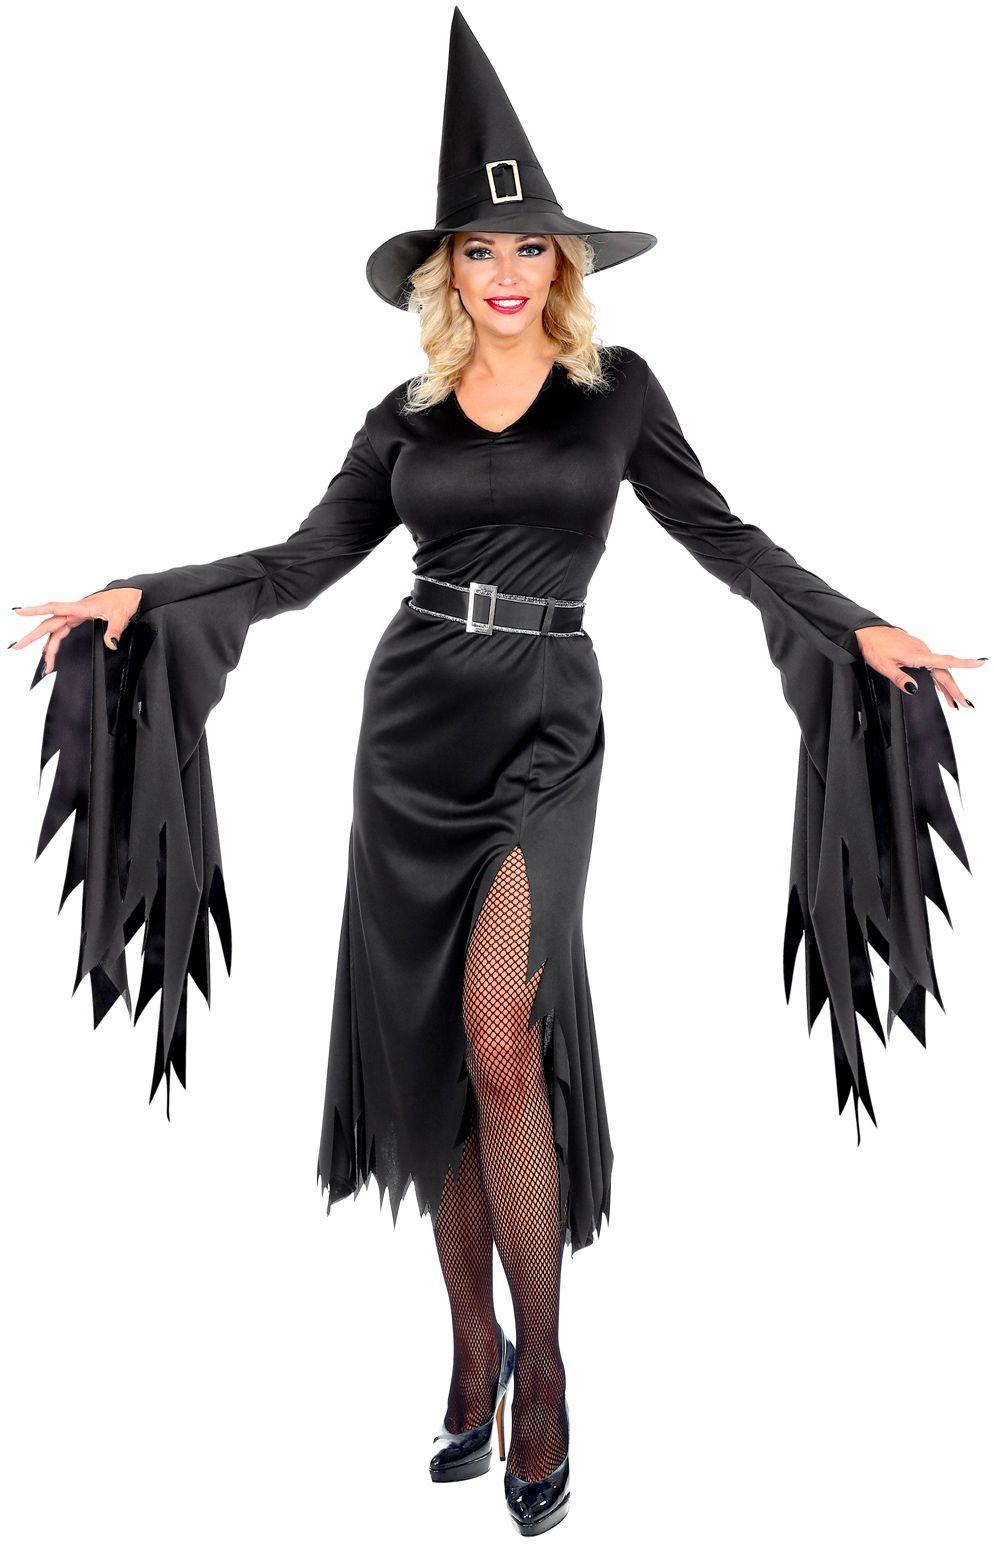 Heksen jurk dames lang